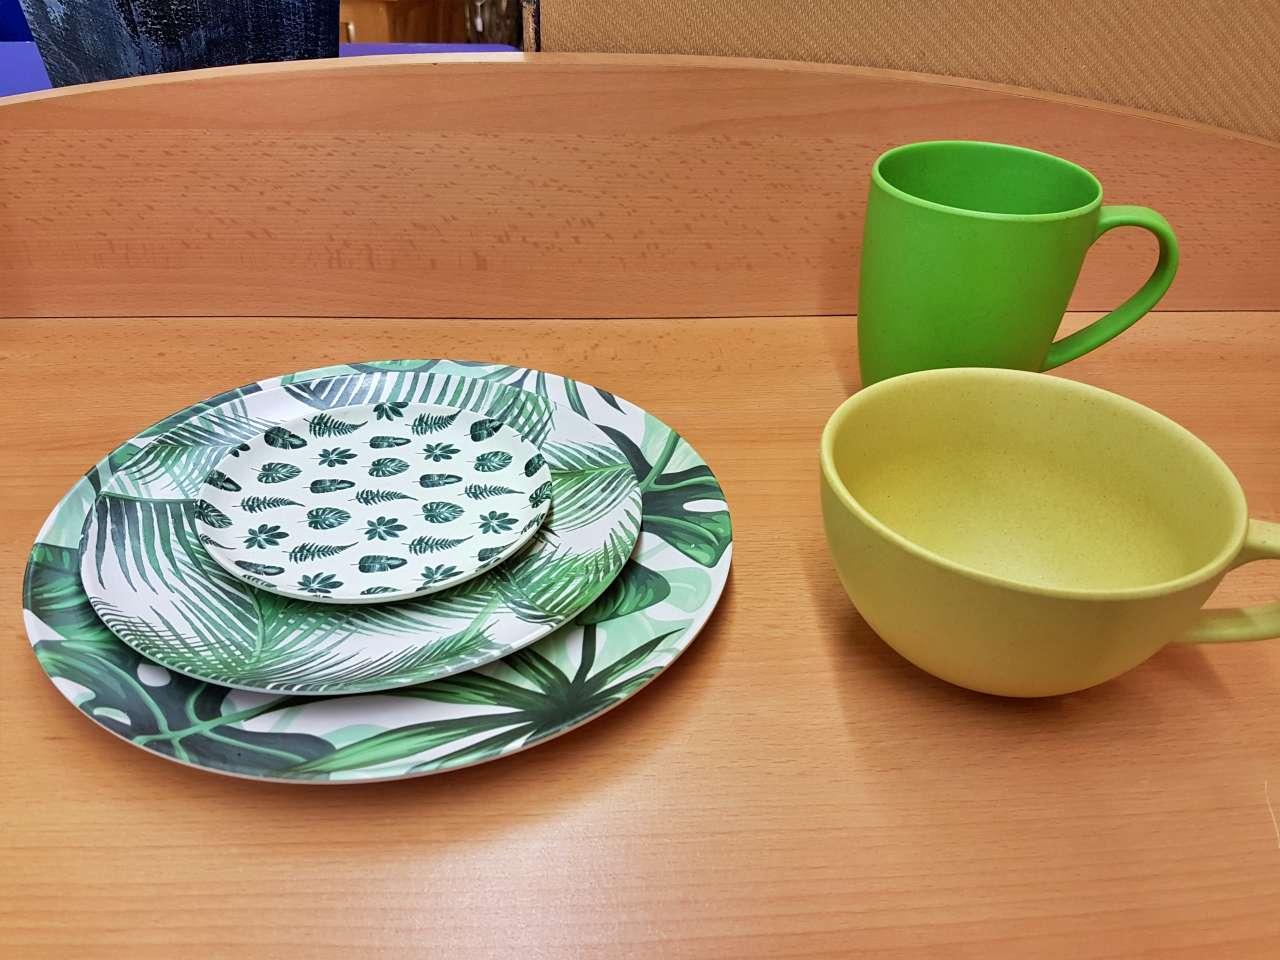 Dekoration Porzellan Teller Tassen